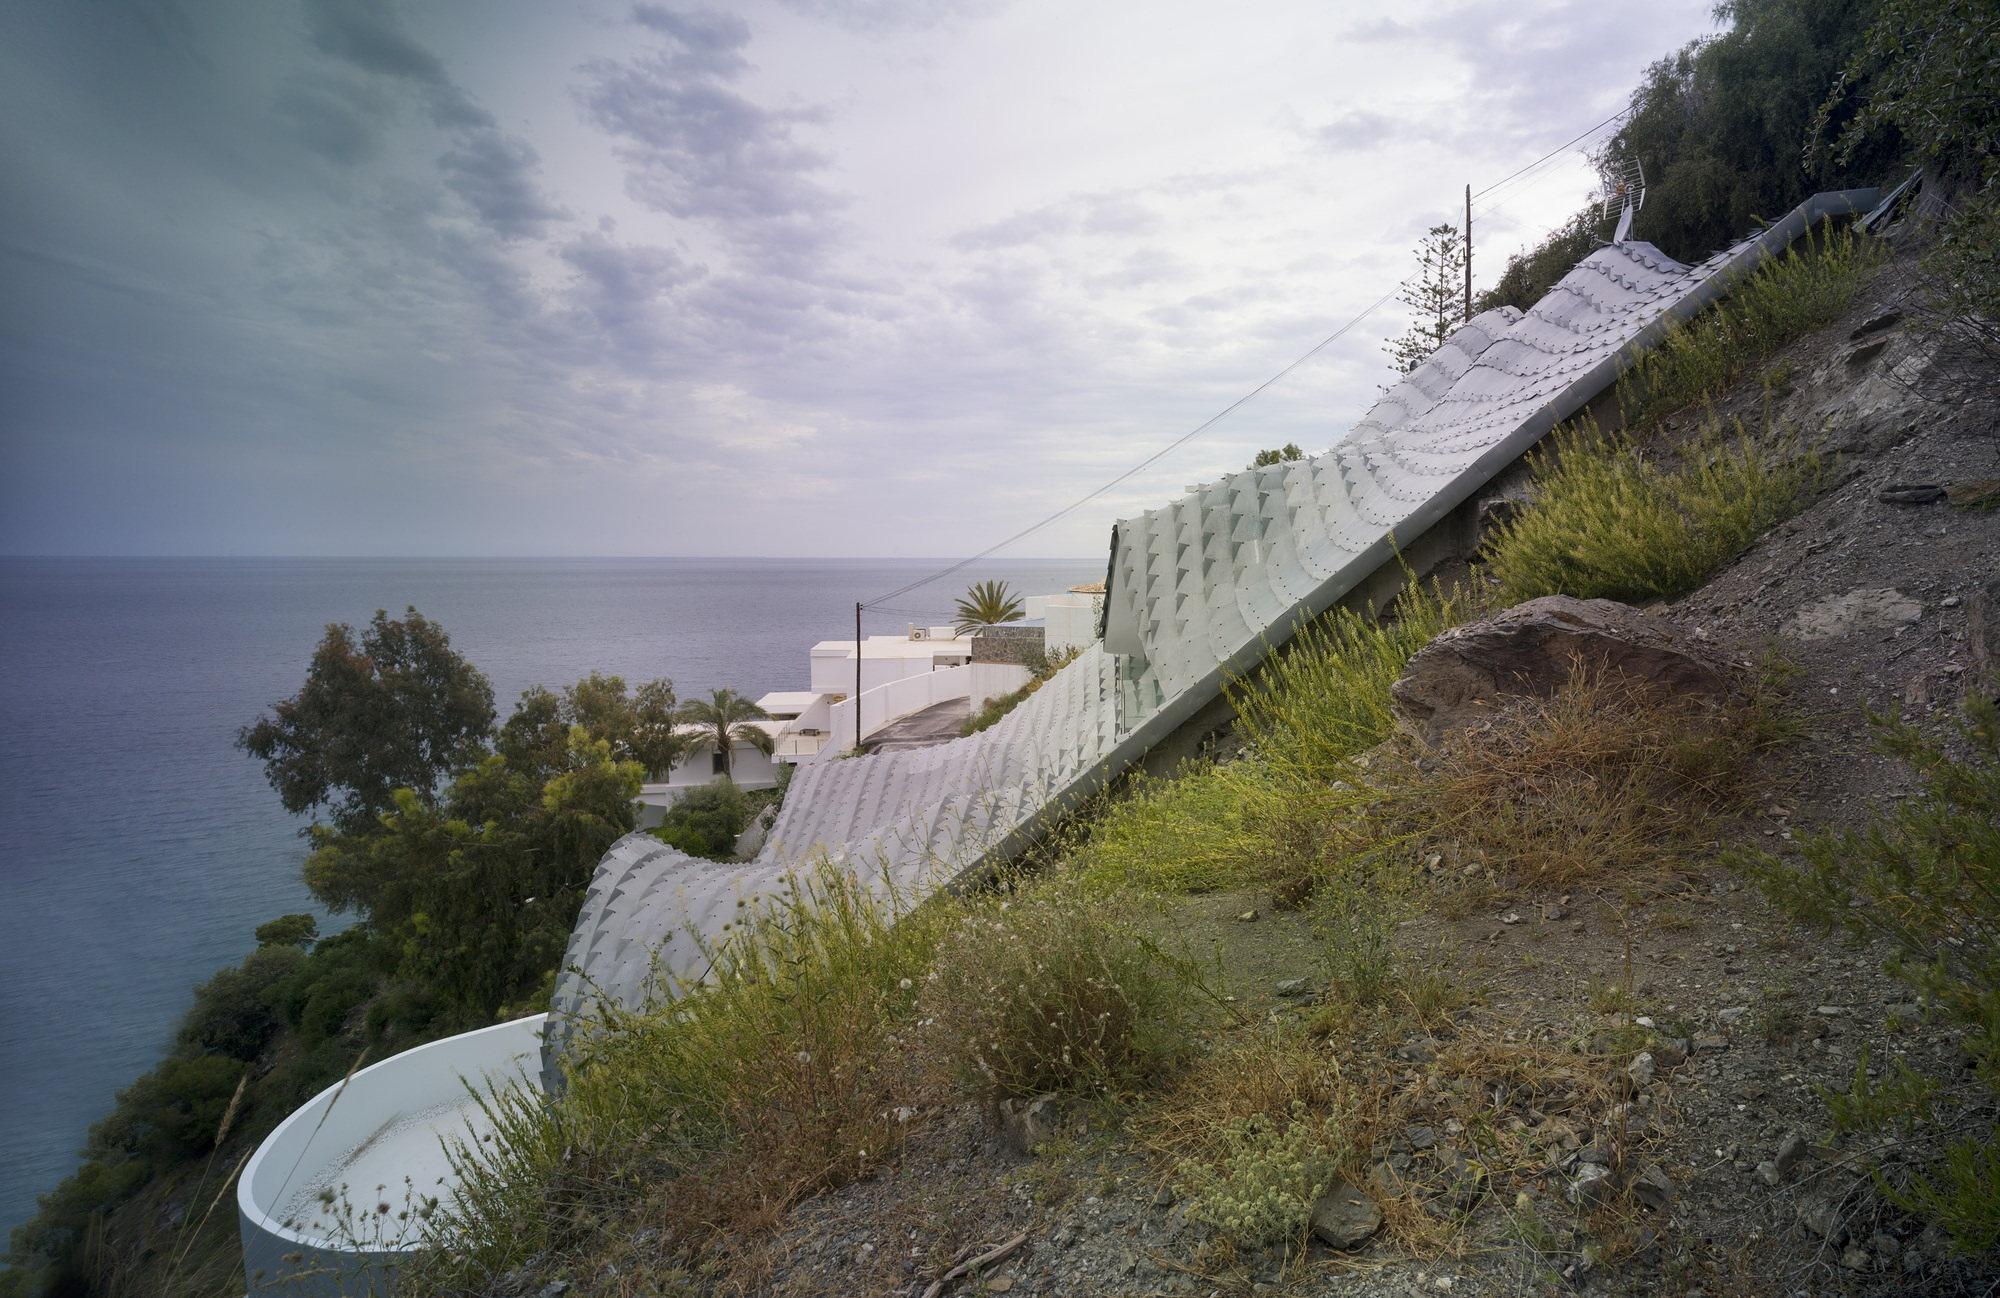 unbelievable-house-on-the-mountain-slope-overlooking-mediterranean-sea-spain-4